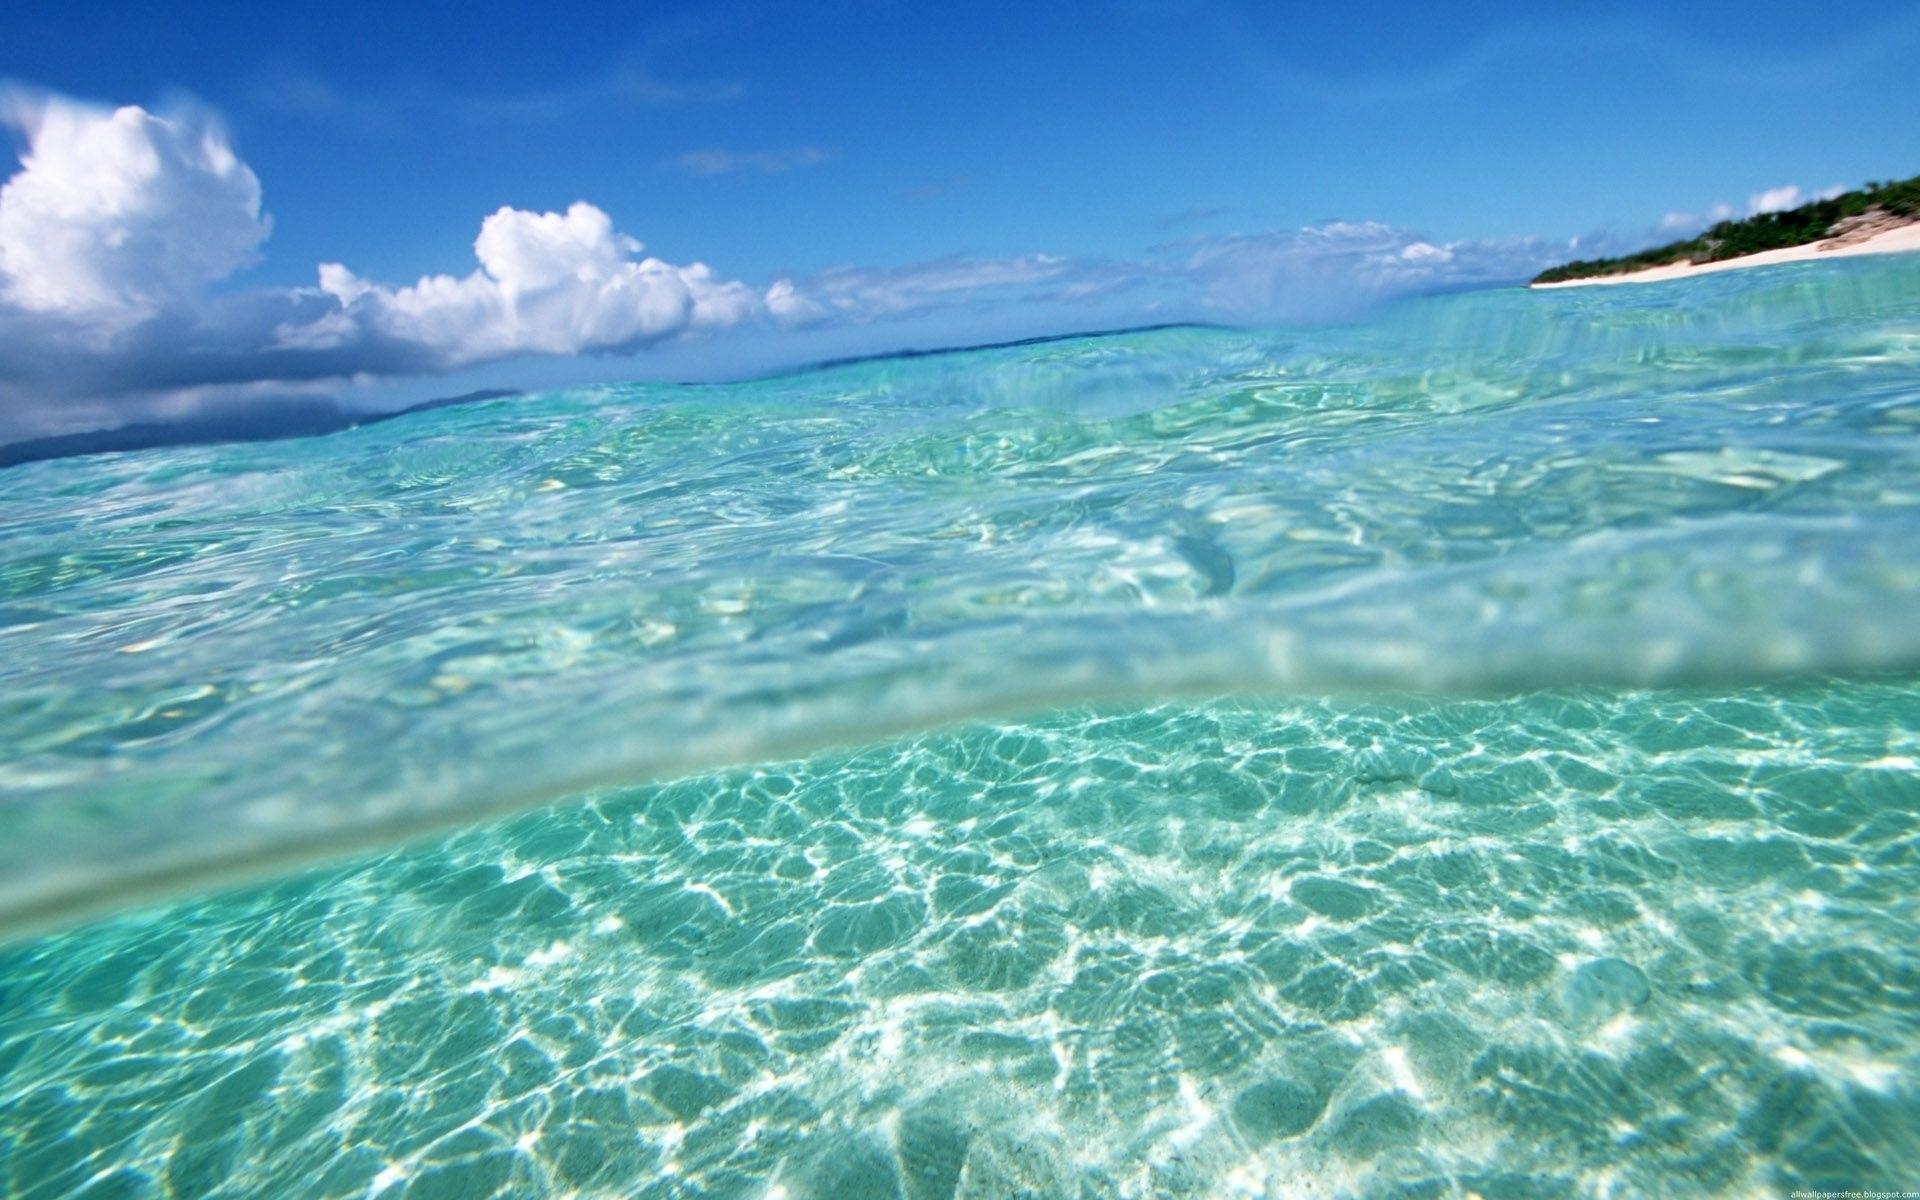 Фотографии пляж море природа ракушки побережье 2880x1800.